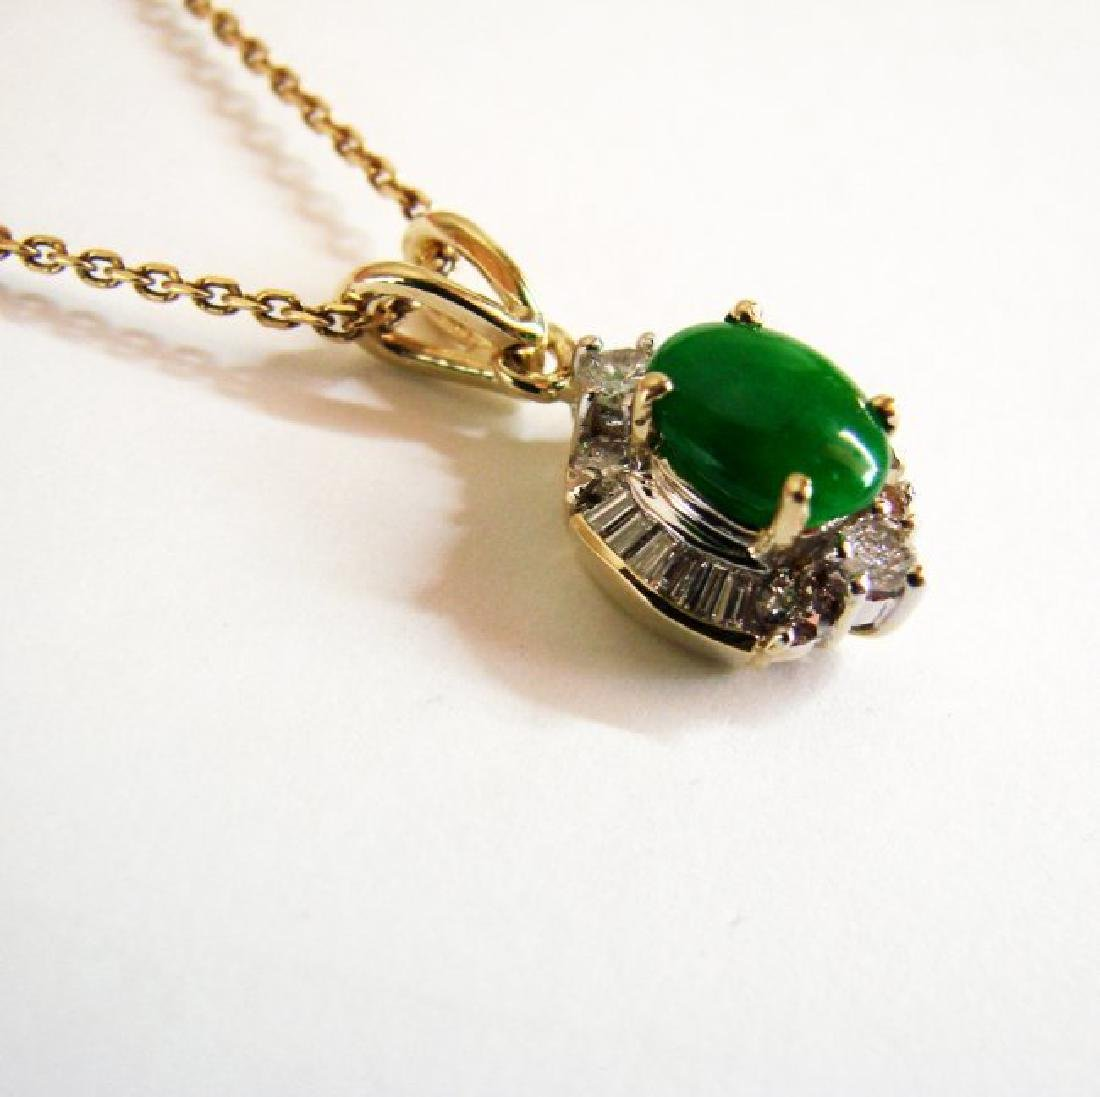 Pendant Imperial Jade/Diamond 1.89Ct 14k Y/g - 3